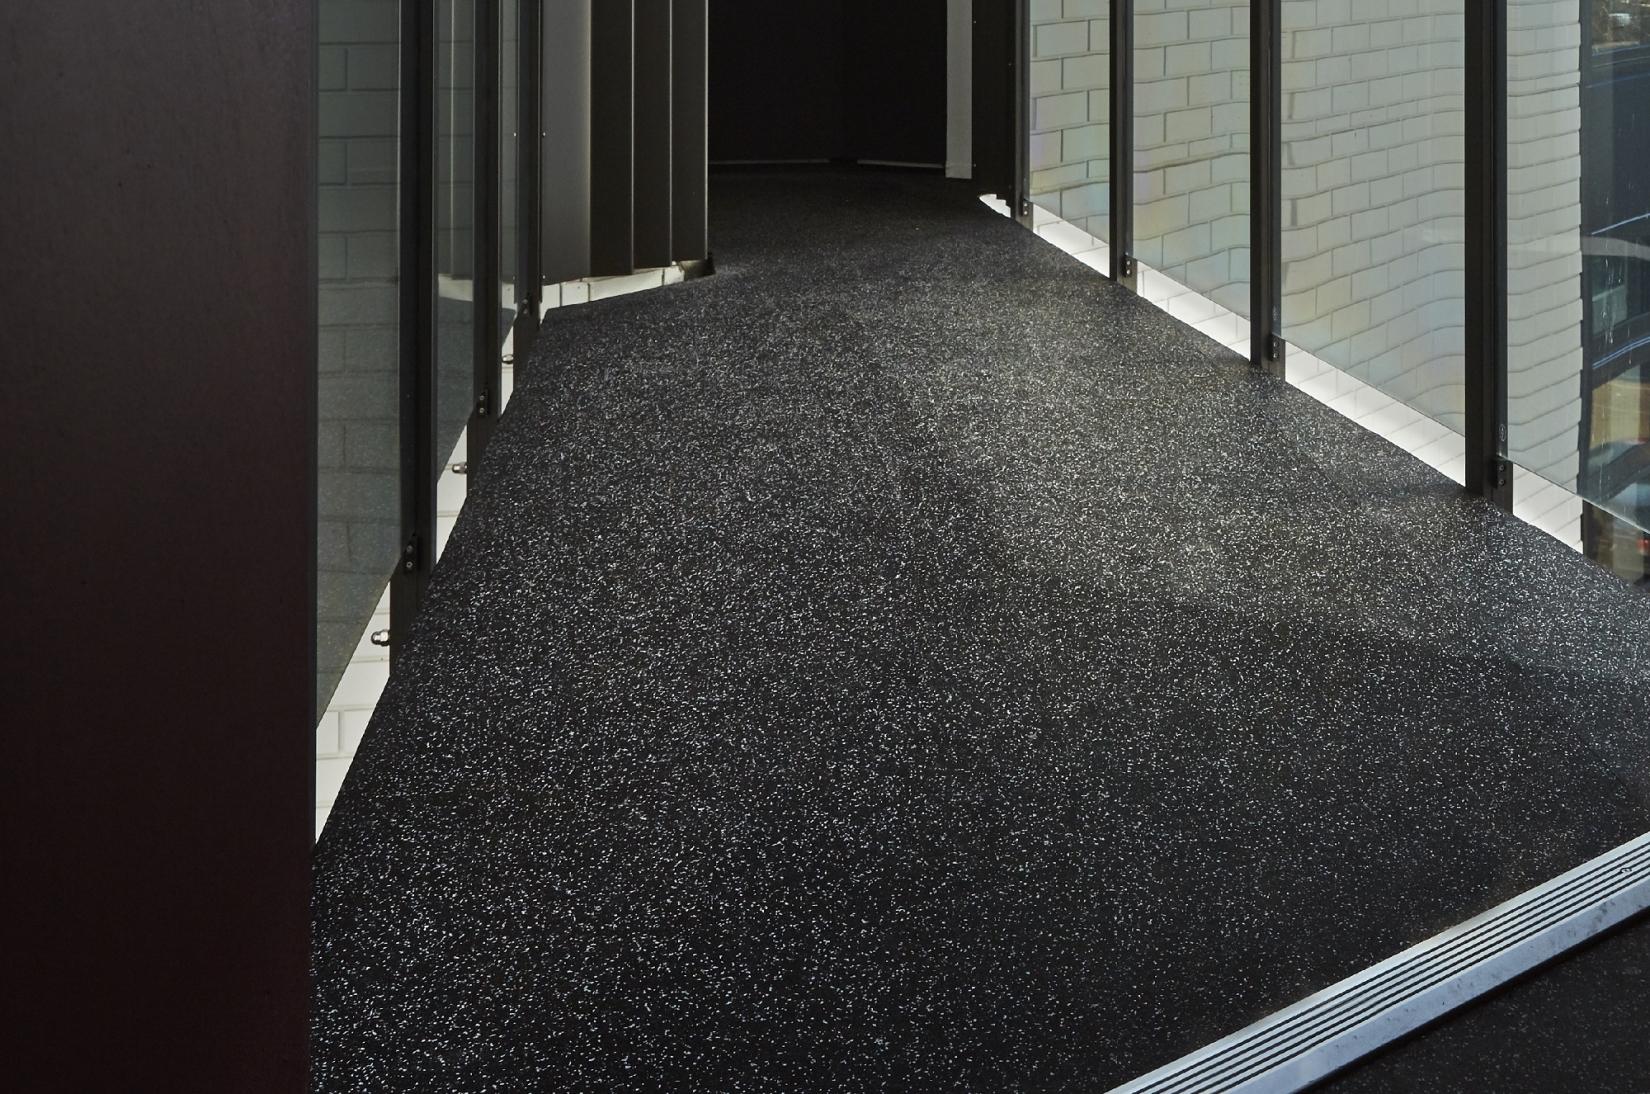 Rubber Flooring - EPDM vs SBR